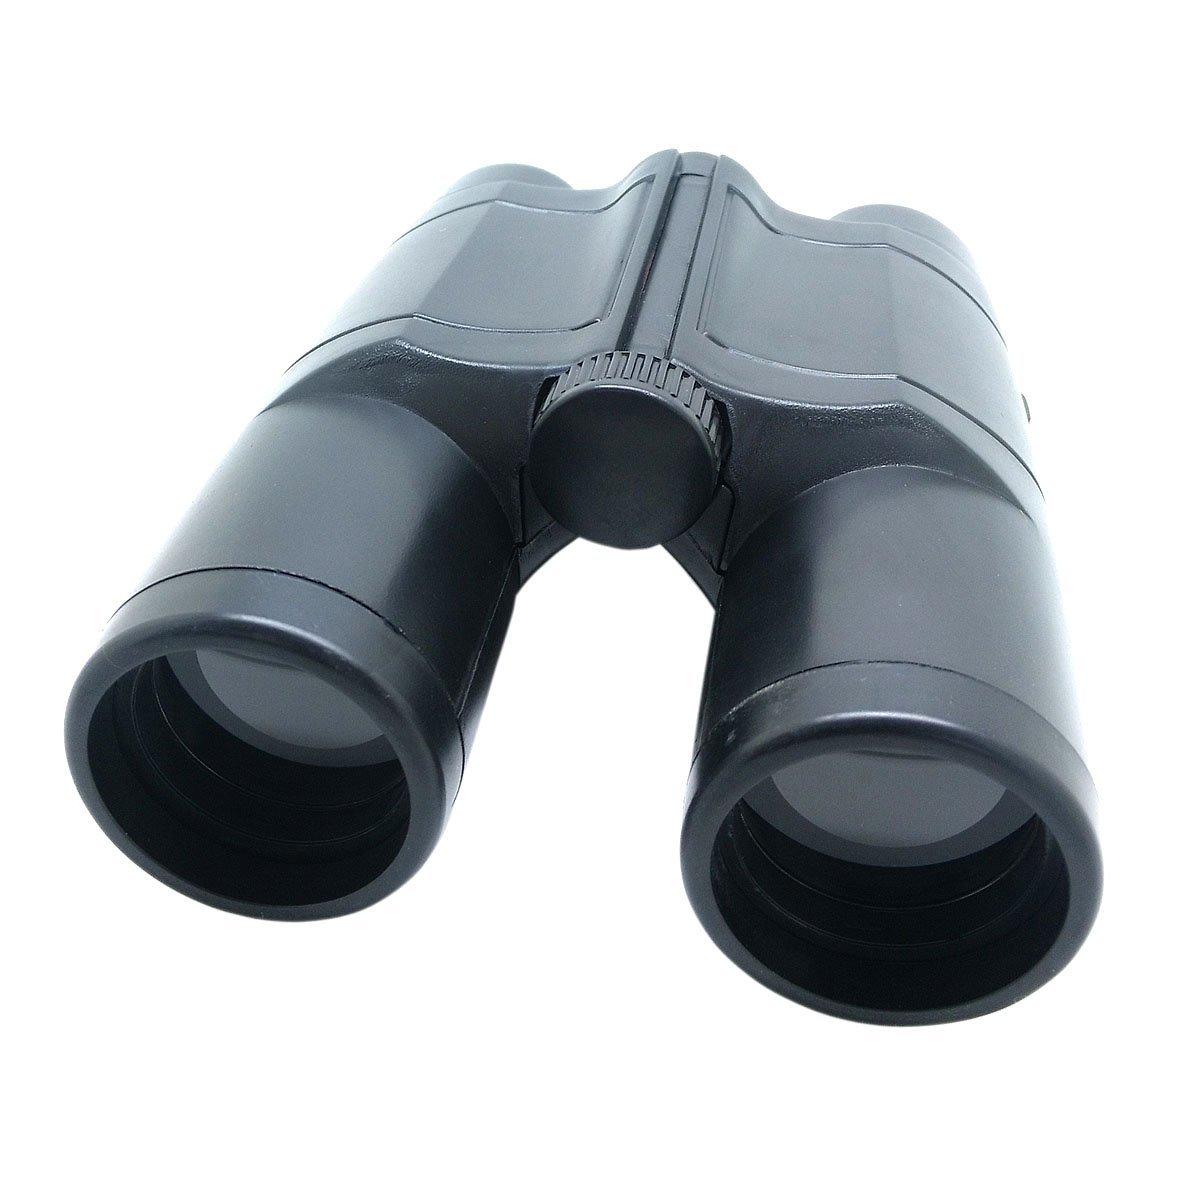 MAGIKON Cool Children Simulation Telescope Binoculars Outdoor Educational toy,4X35mm LittleTiger